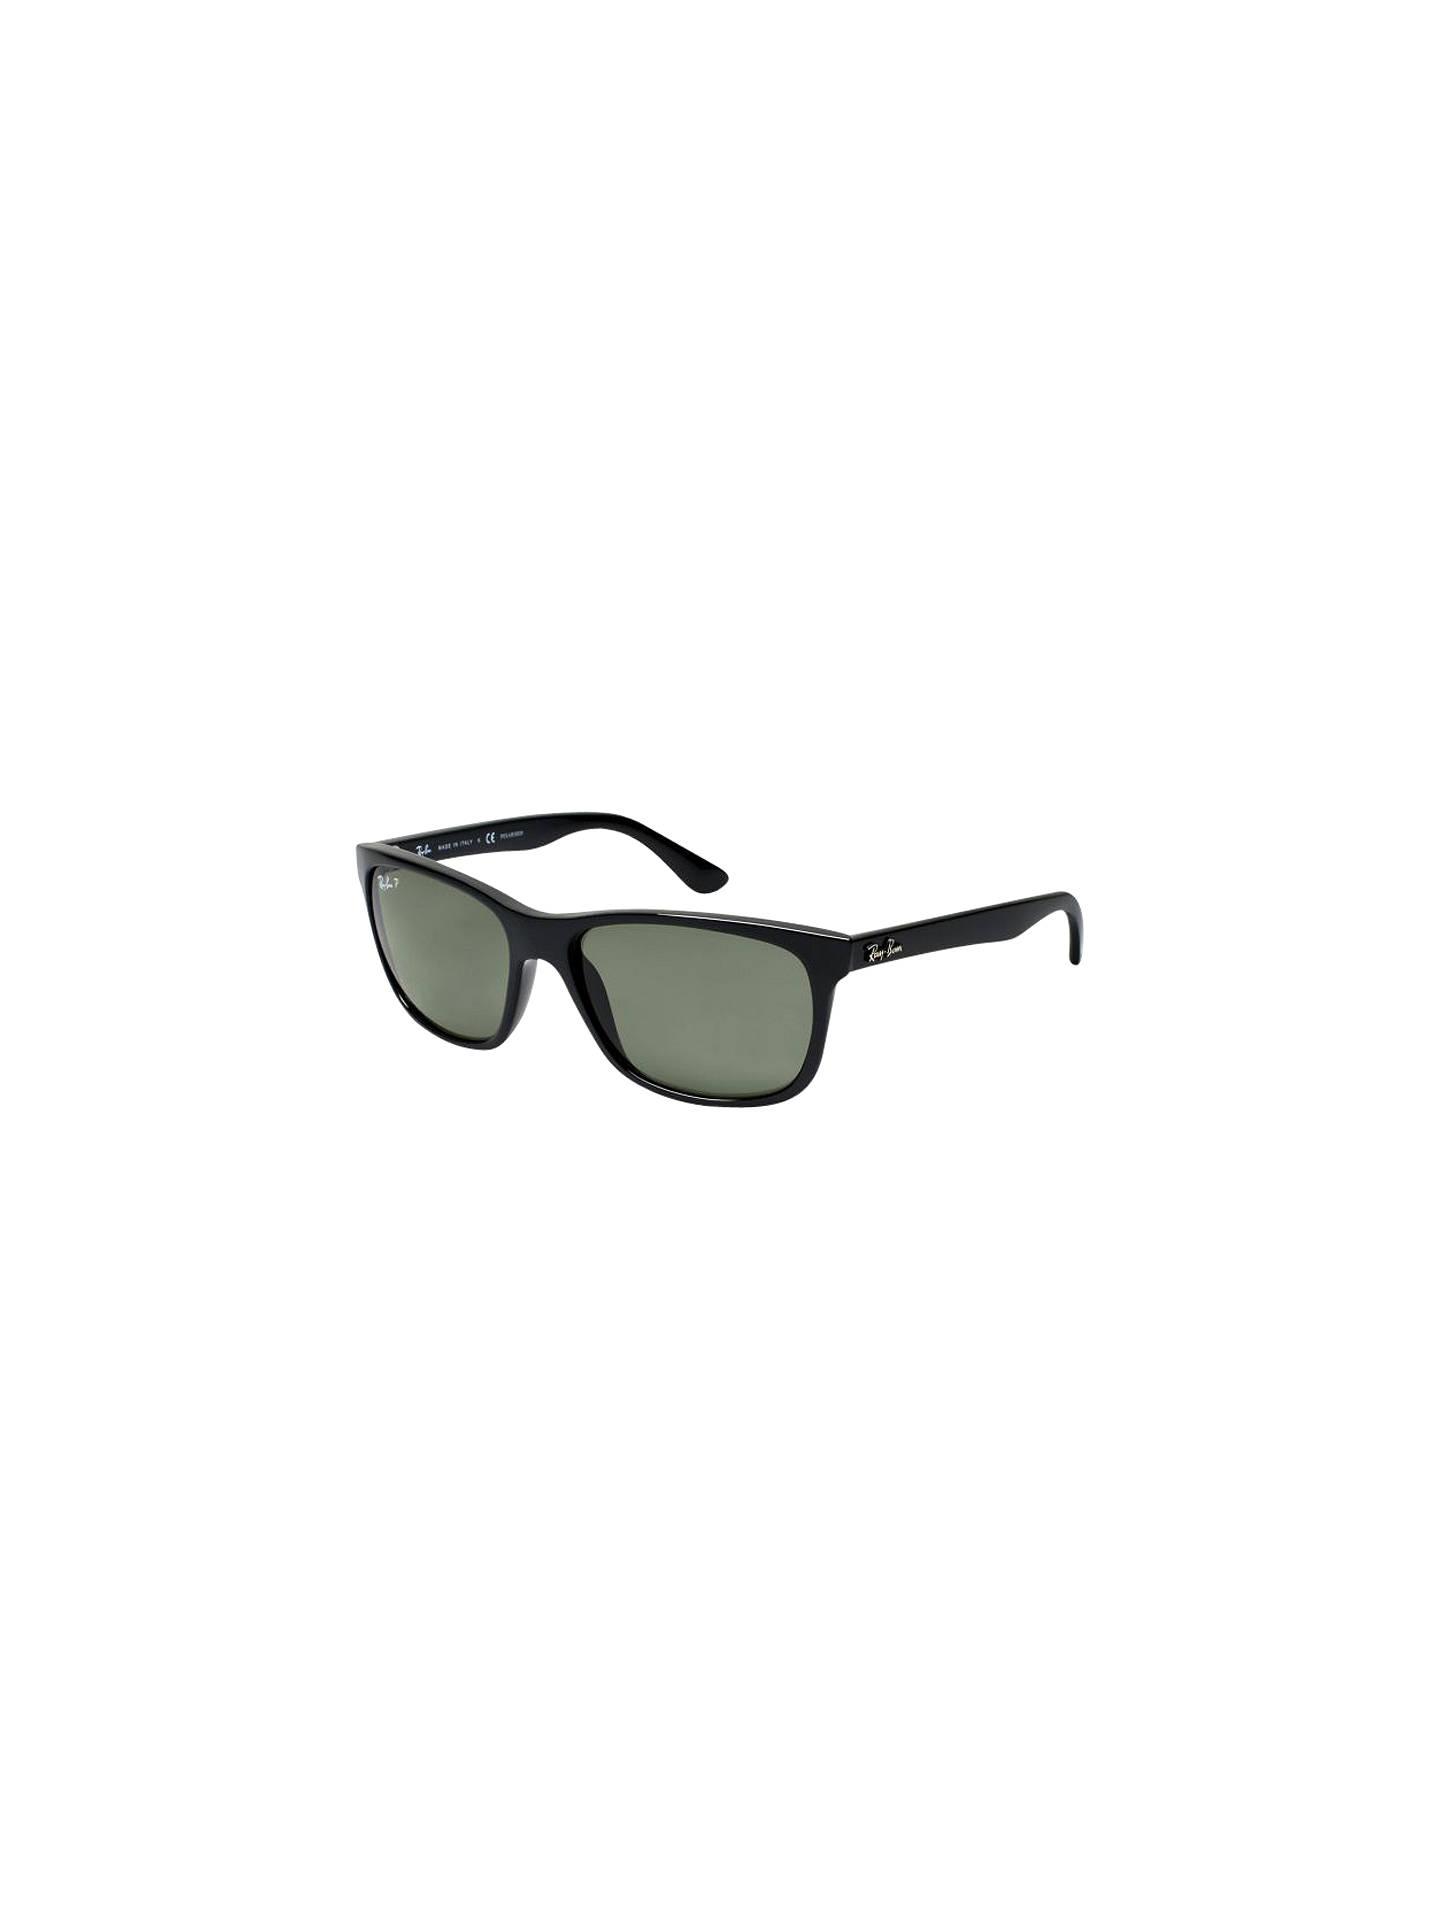 0c7f1bf471 Buy Ray-Ban RB4181 Polarised Classic Sunglasses